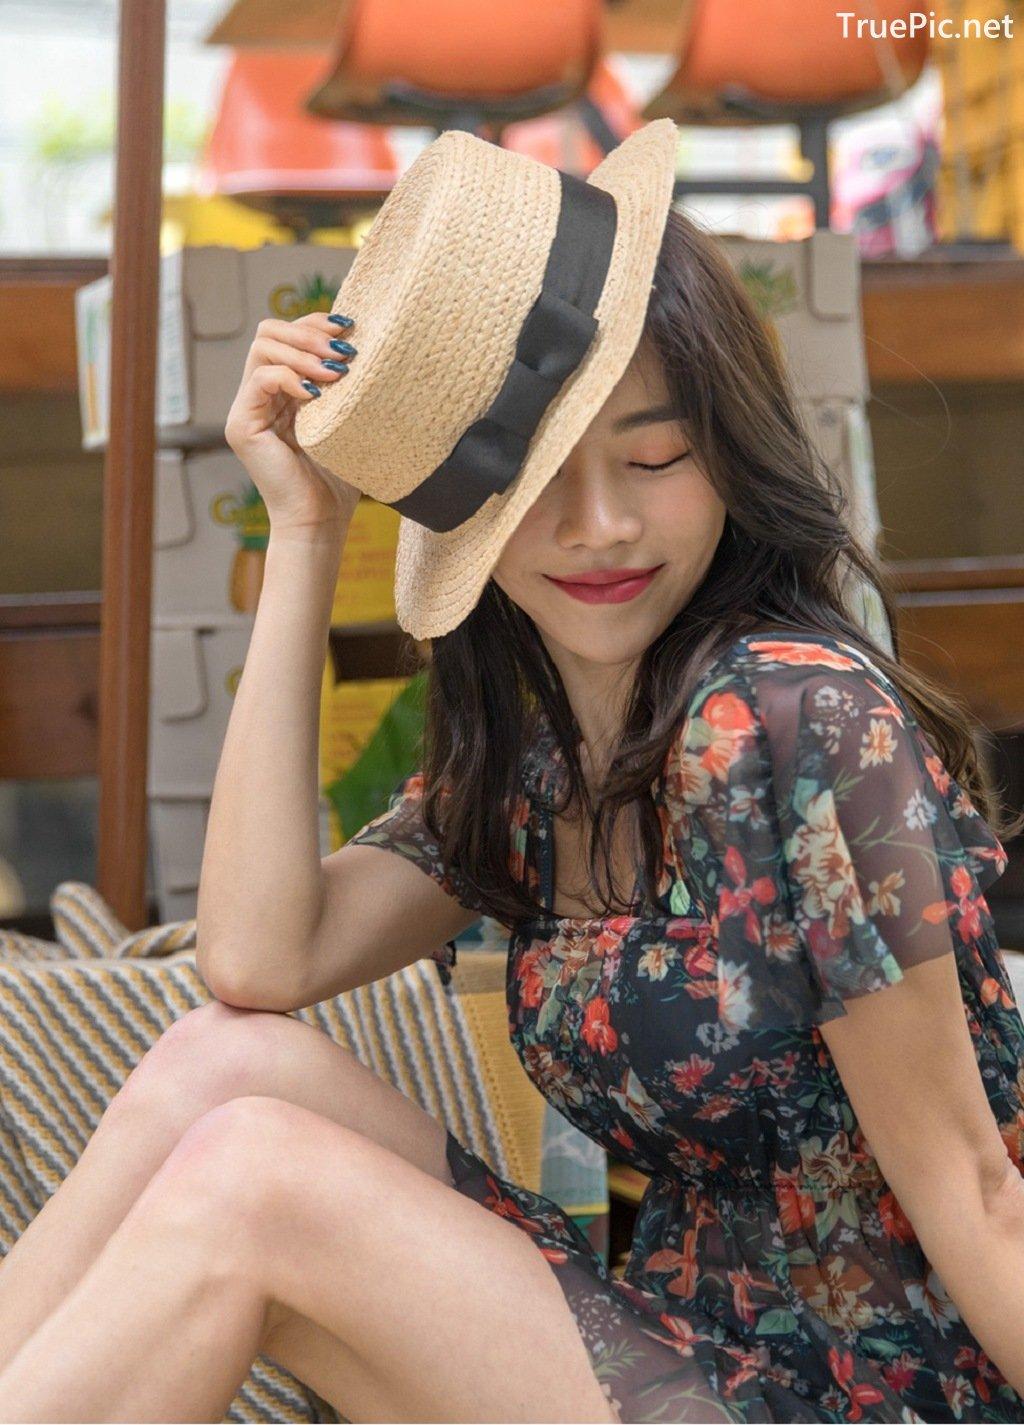 Image-An-Seo-Rin-Flower-and-Butterfly-Bikini-Korean-Model-Fashion-TruePic.net- Picture-8